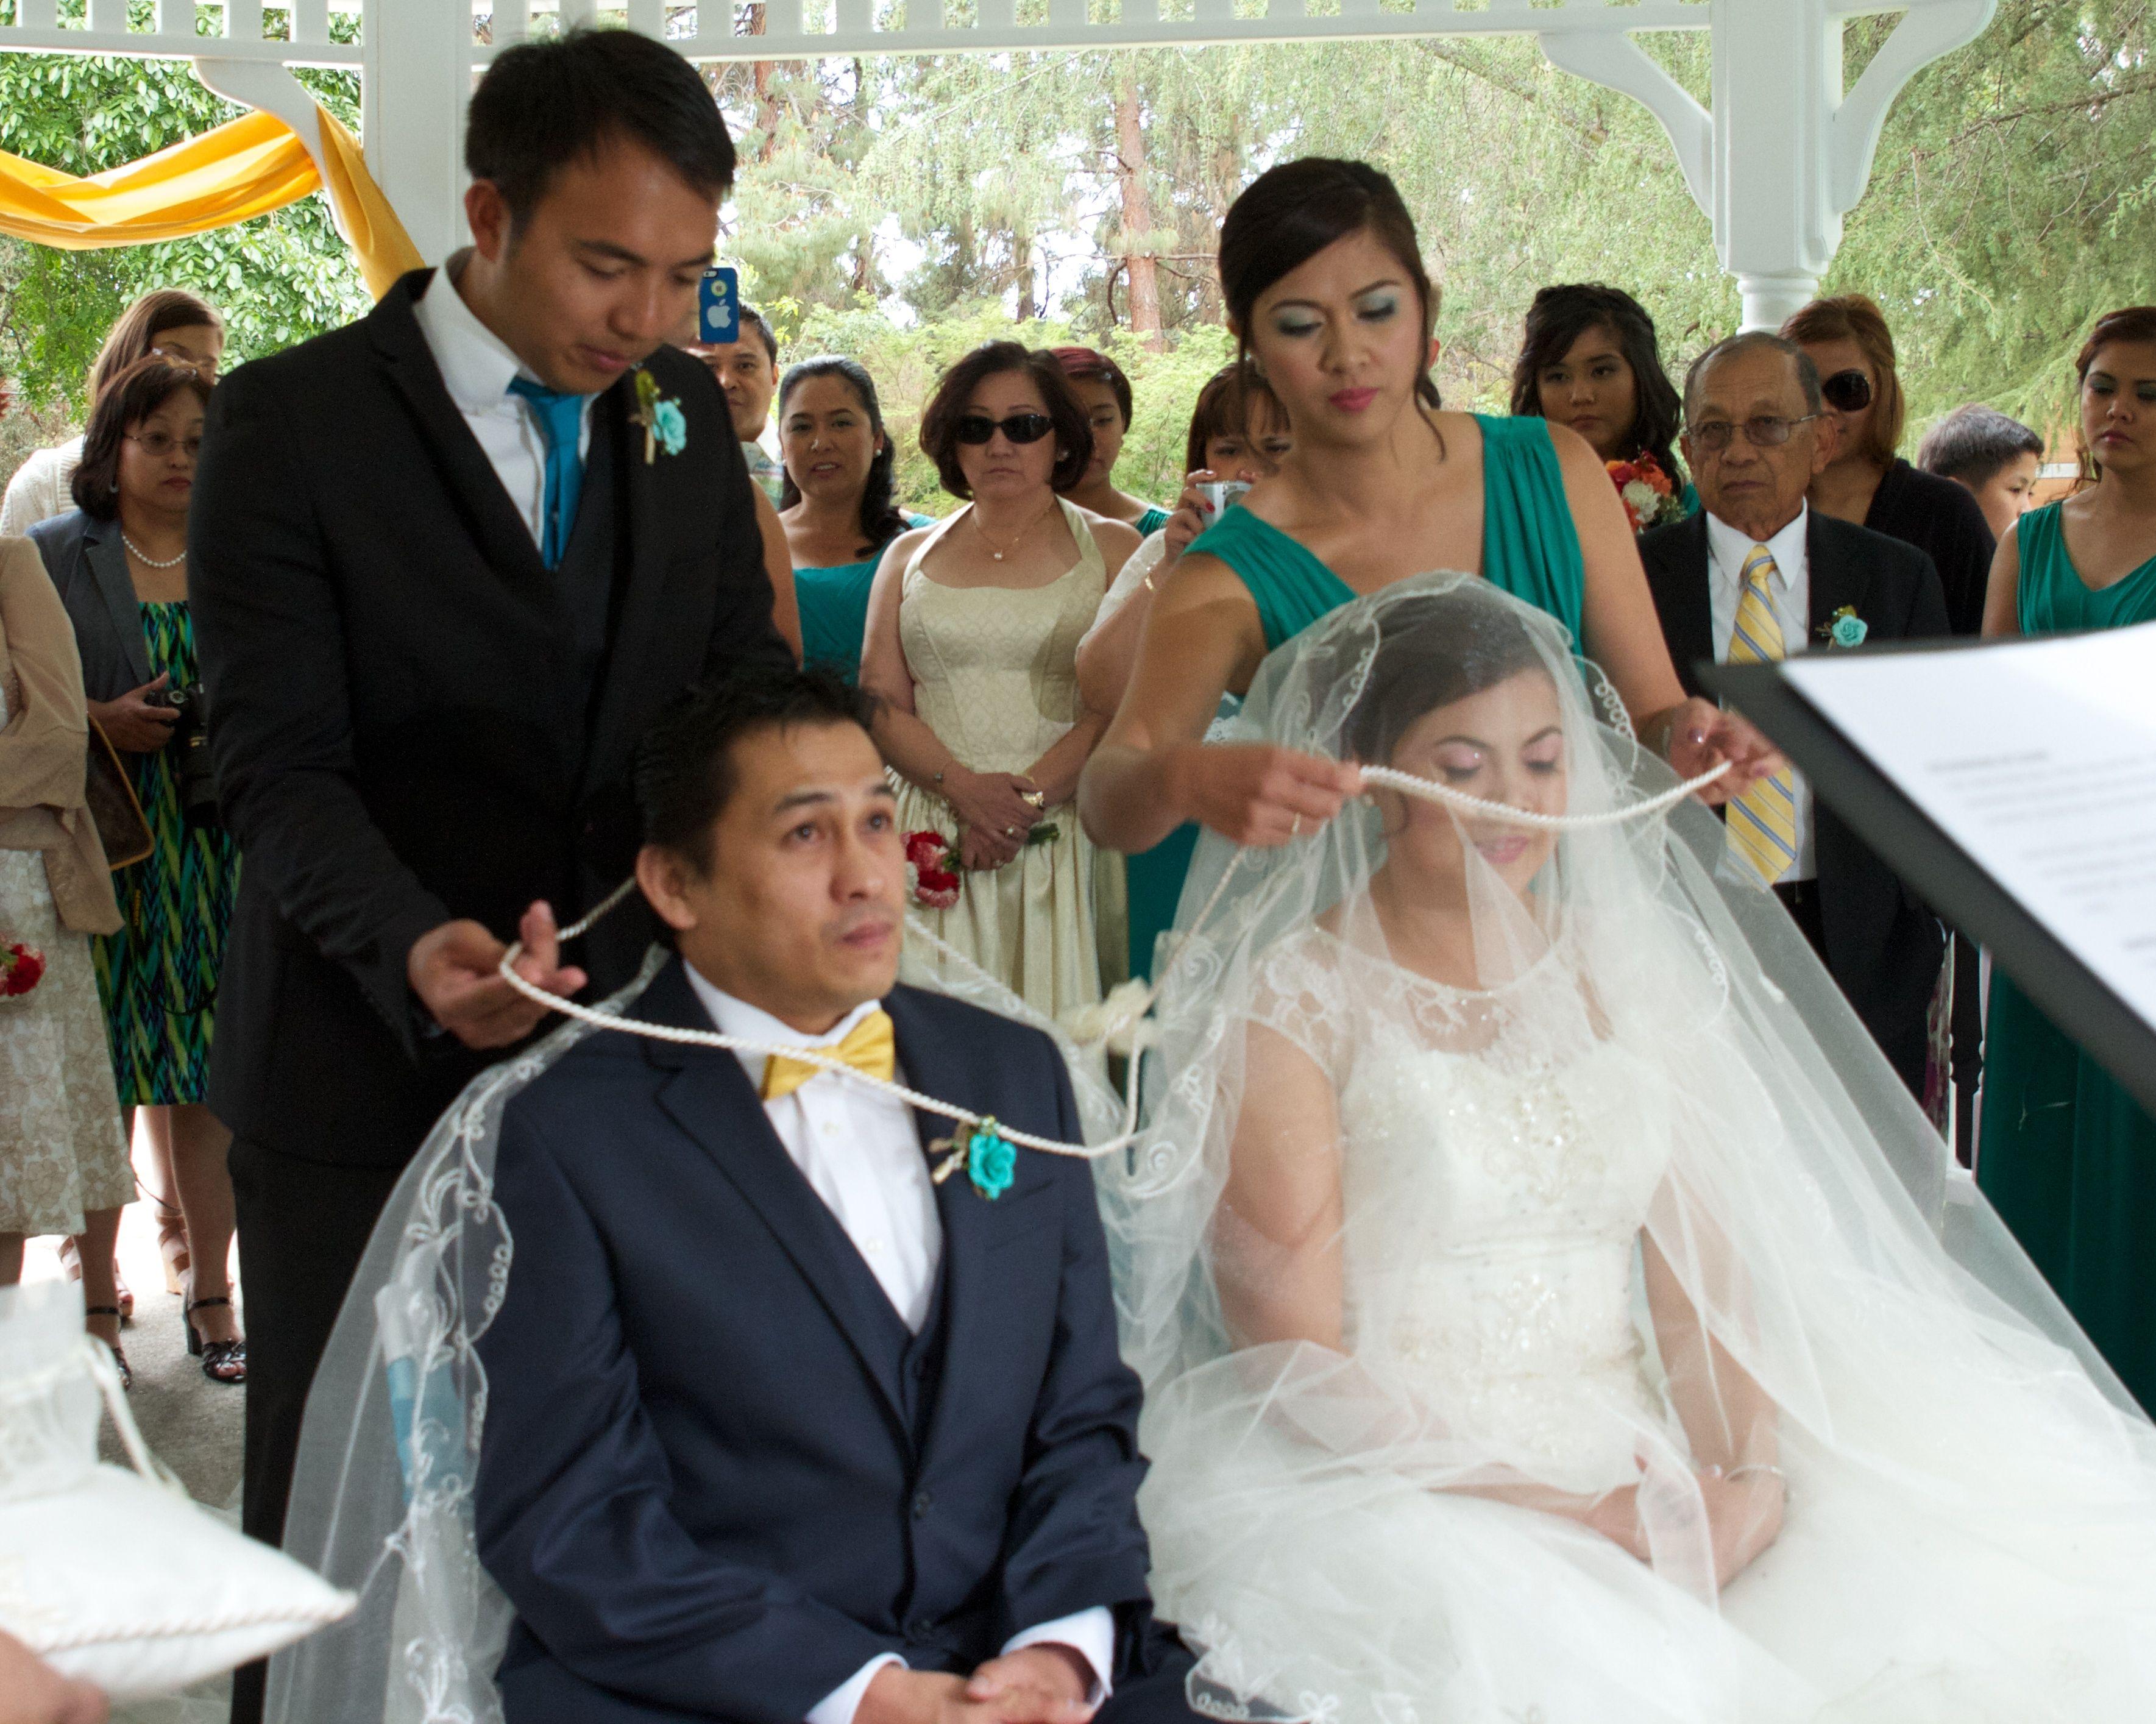 traditional filipino veilcord and coins wedding ceremony by senior pastor tomas of calistoga